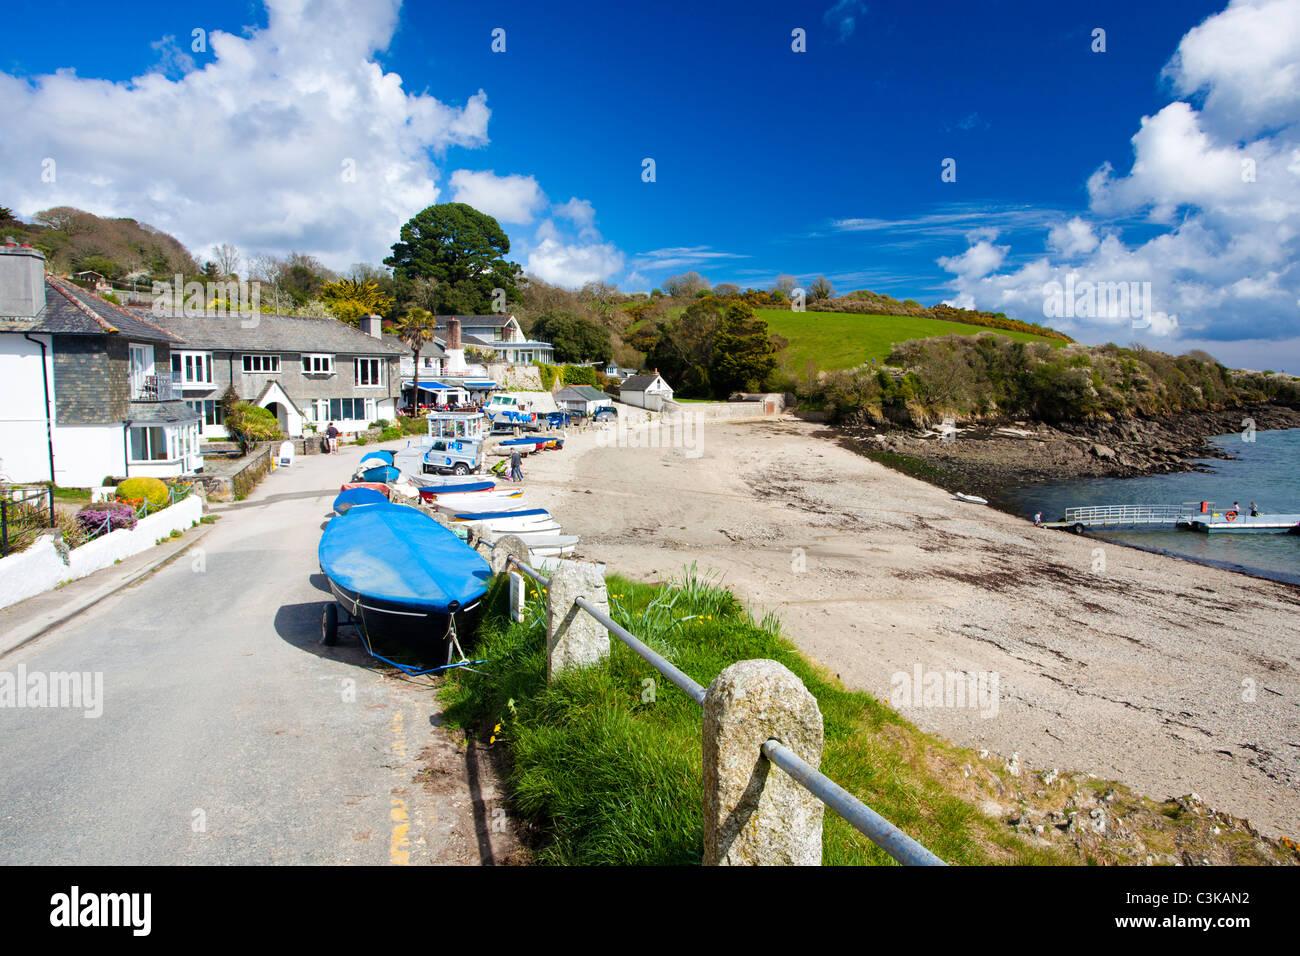 The Village Of Helford Passage Cornwall England UK